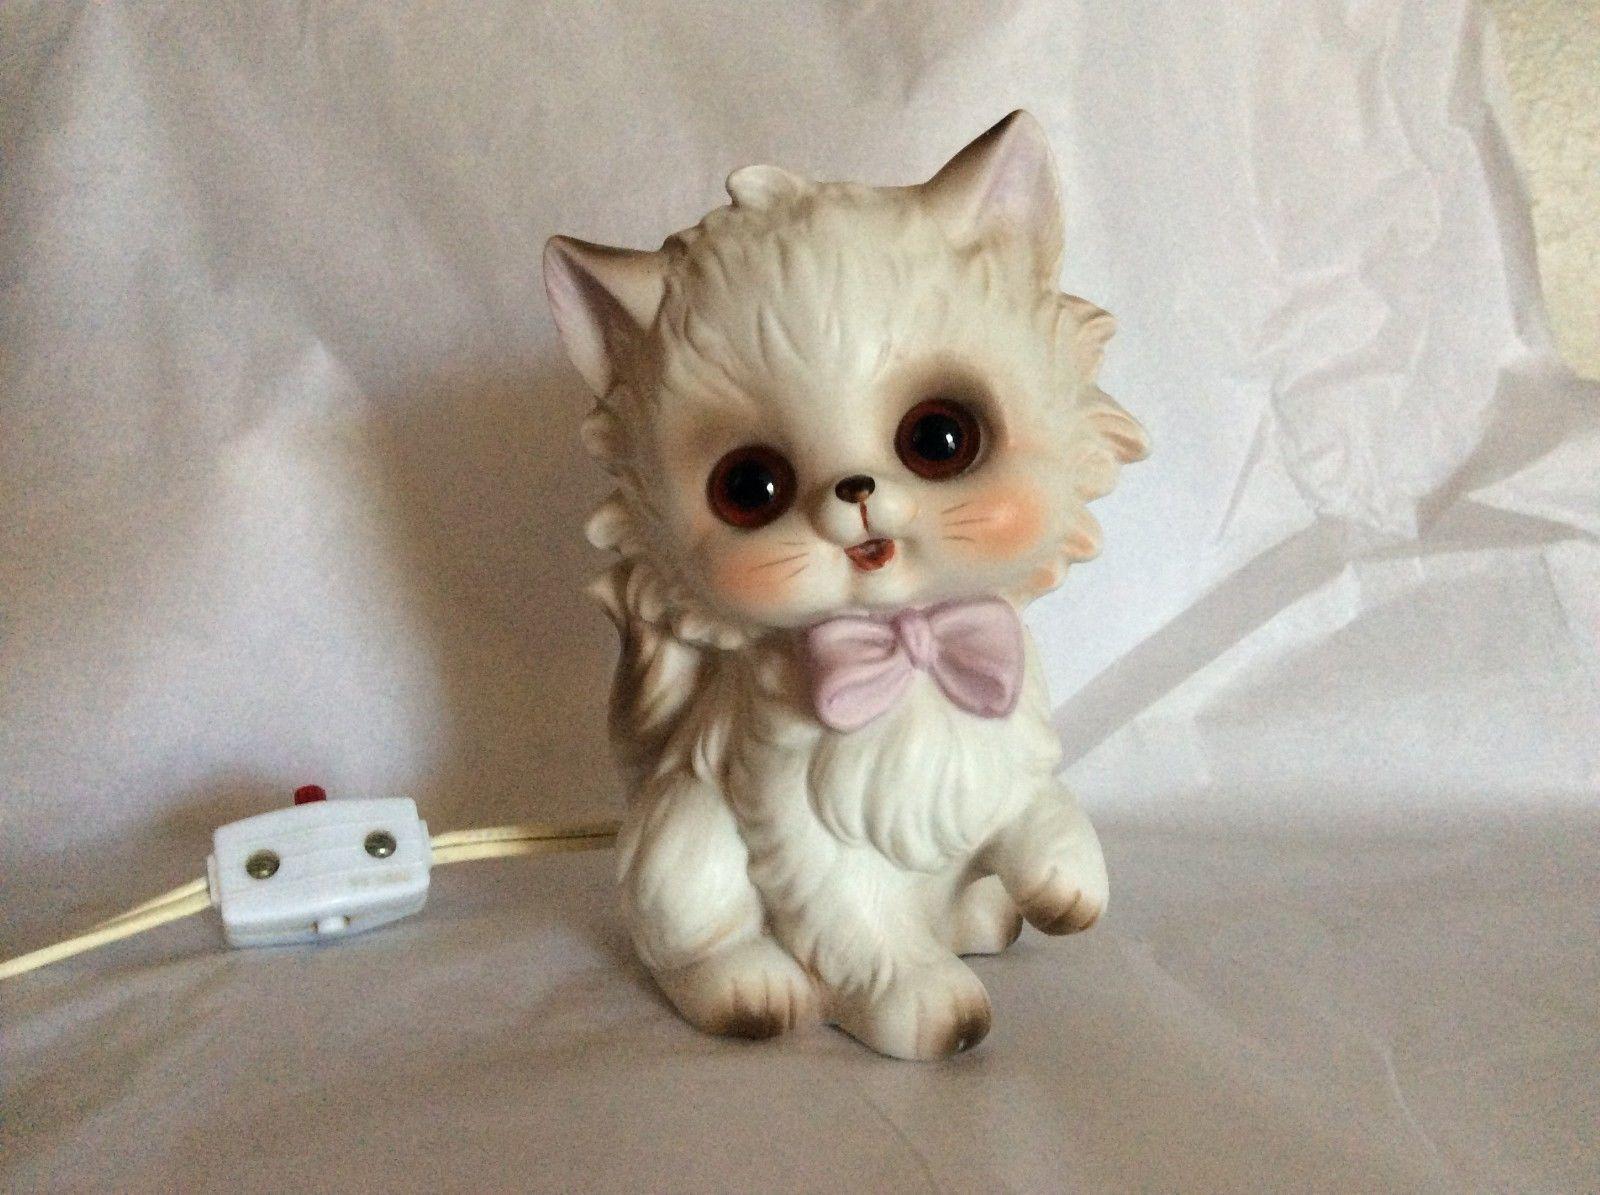 Kitteh Kats. Cat Photos, Cat Gifs, Cat Funny, Kitten pics